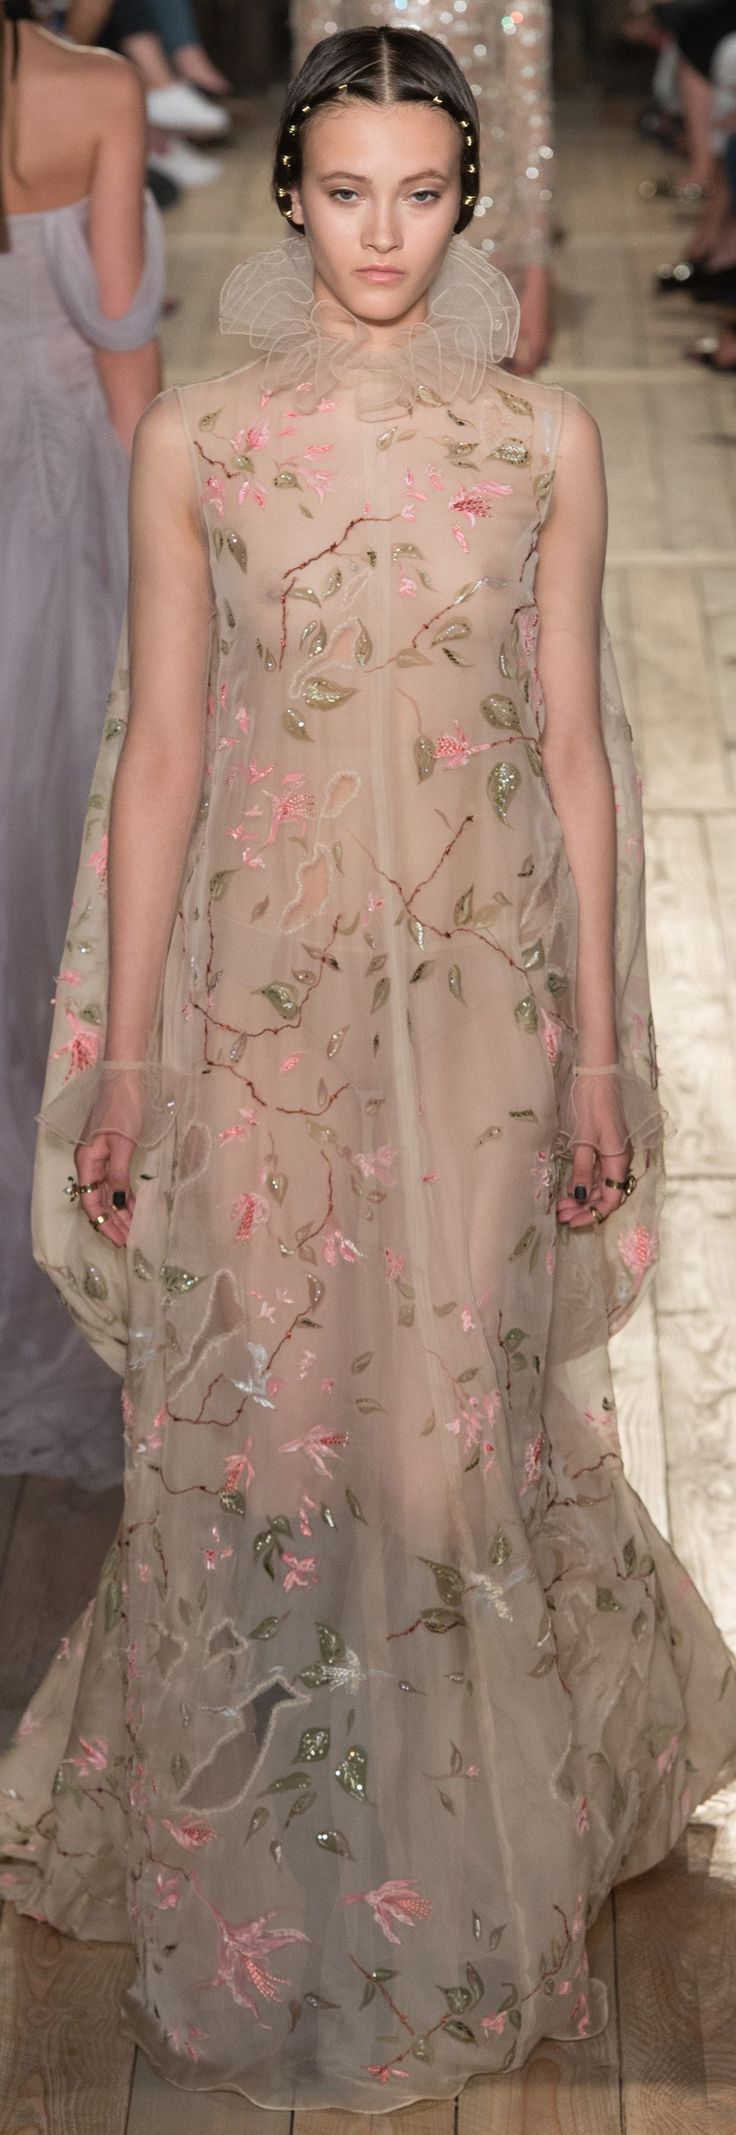 Valentino Fall 2016 Couture (=)